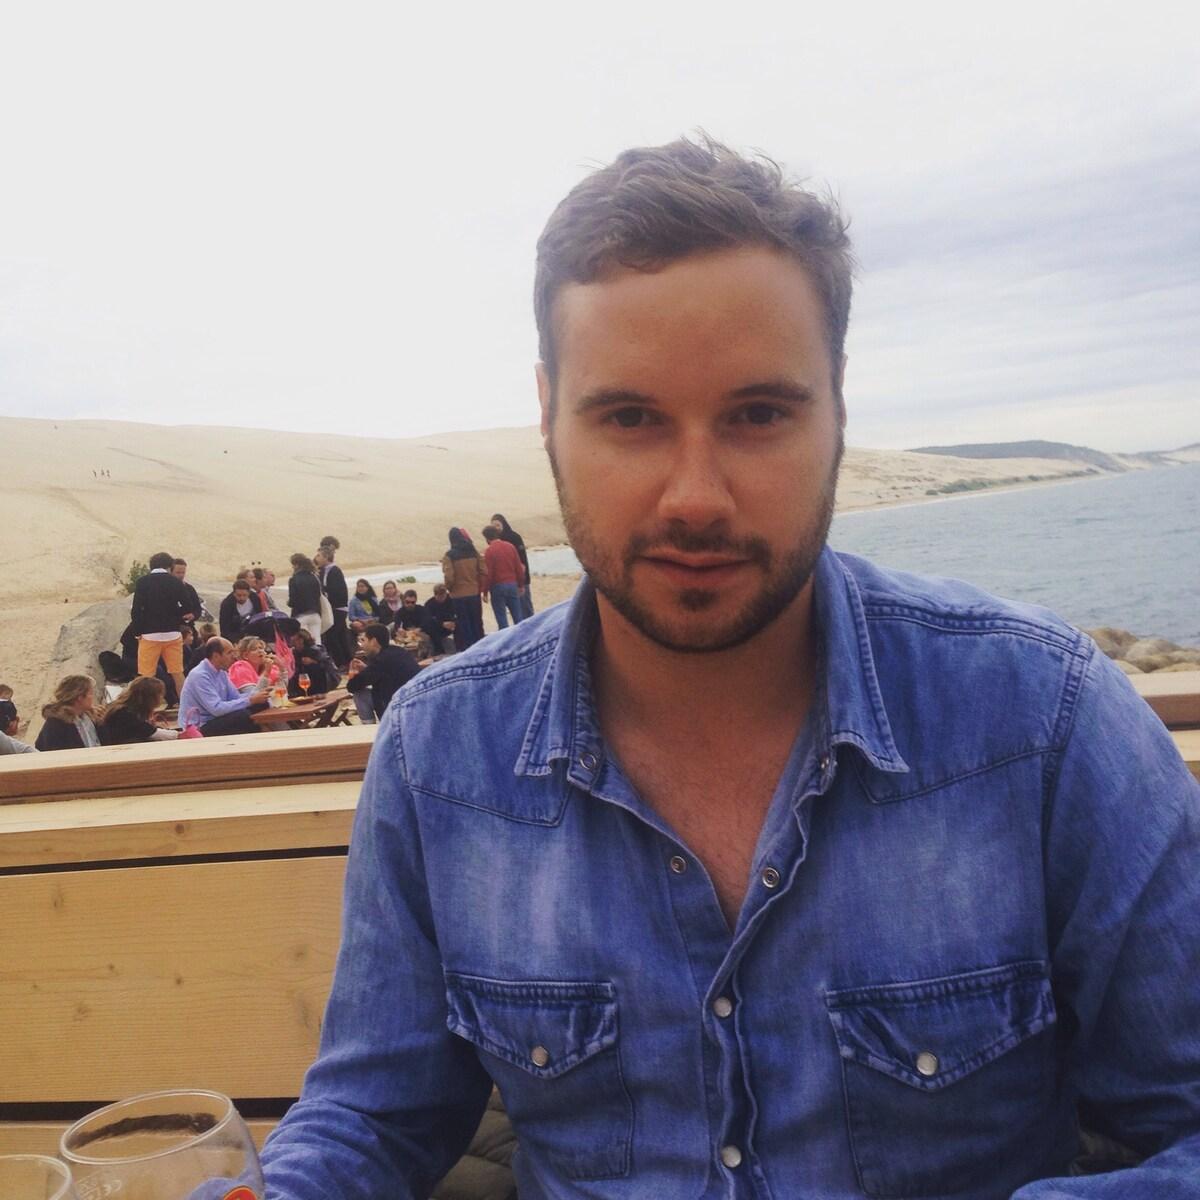 Benoit From Levallois-Perret, France